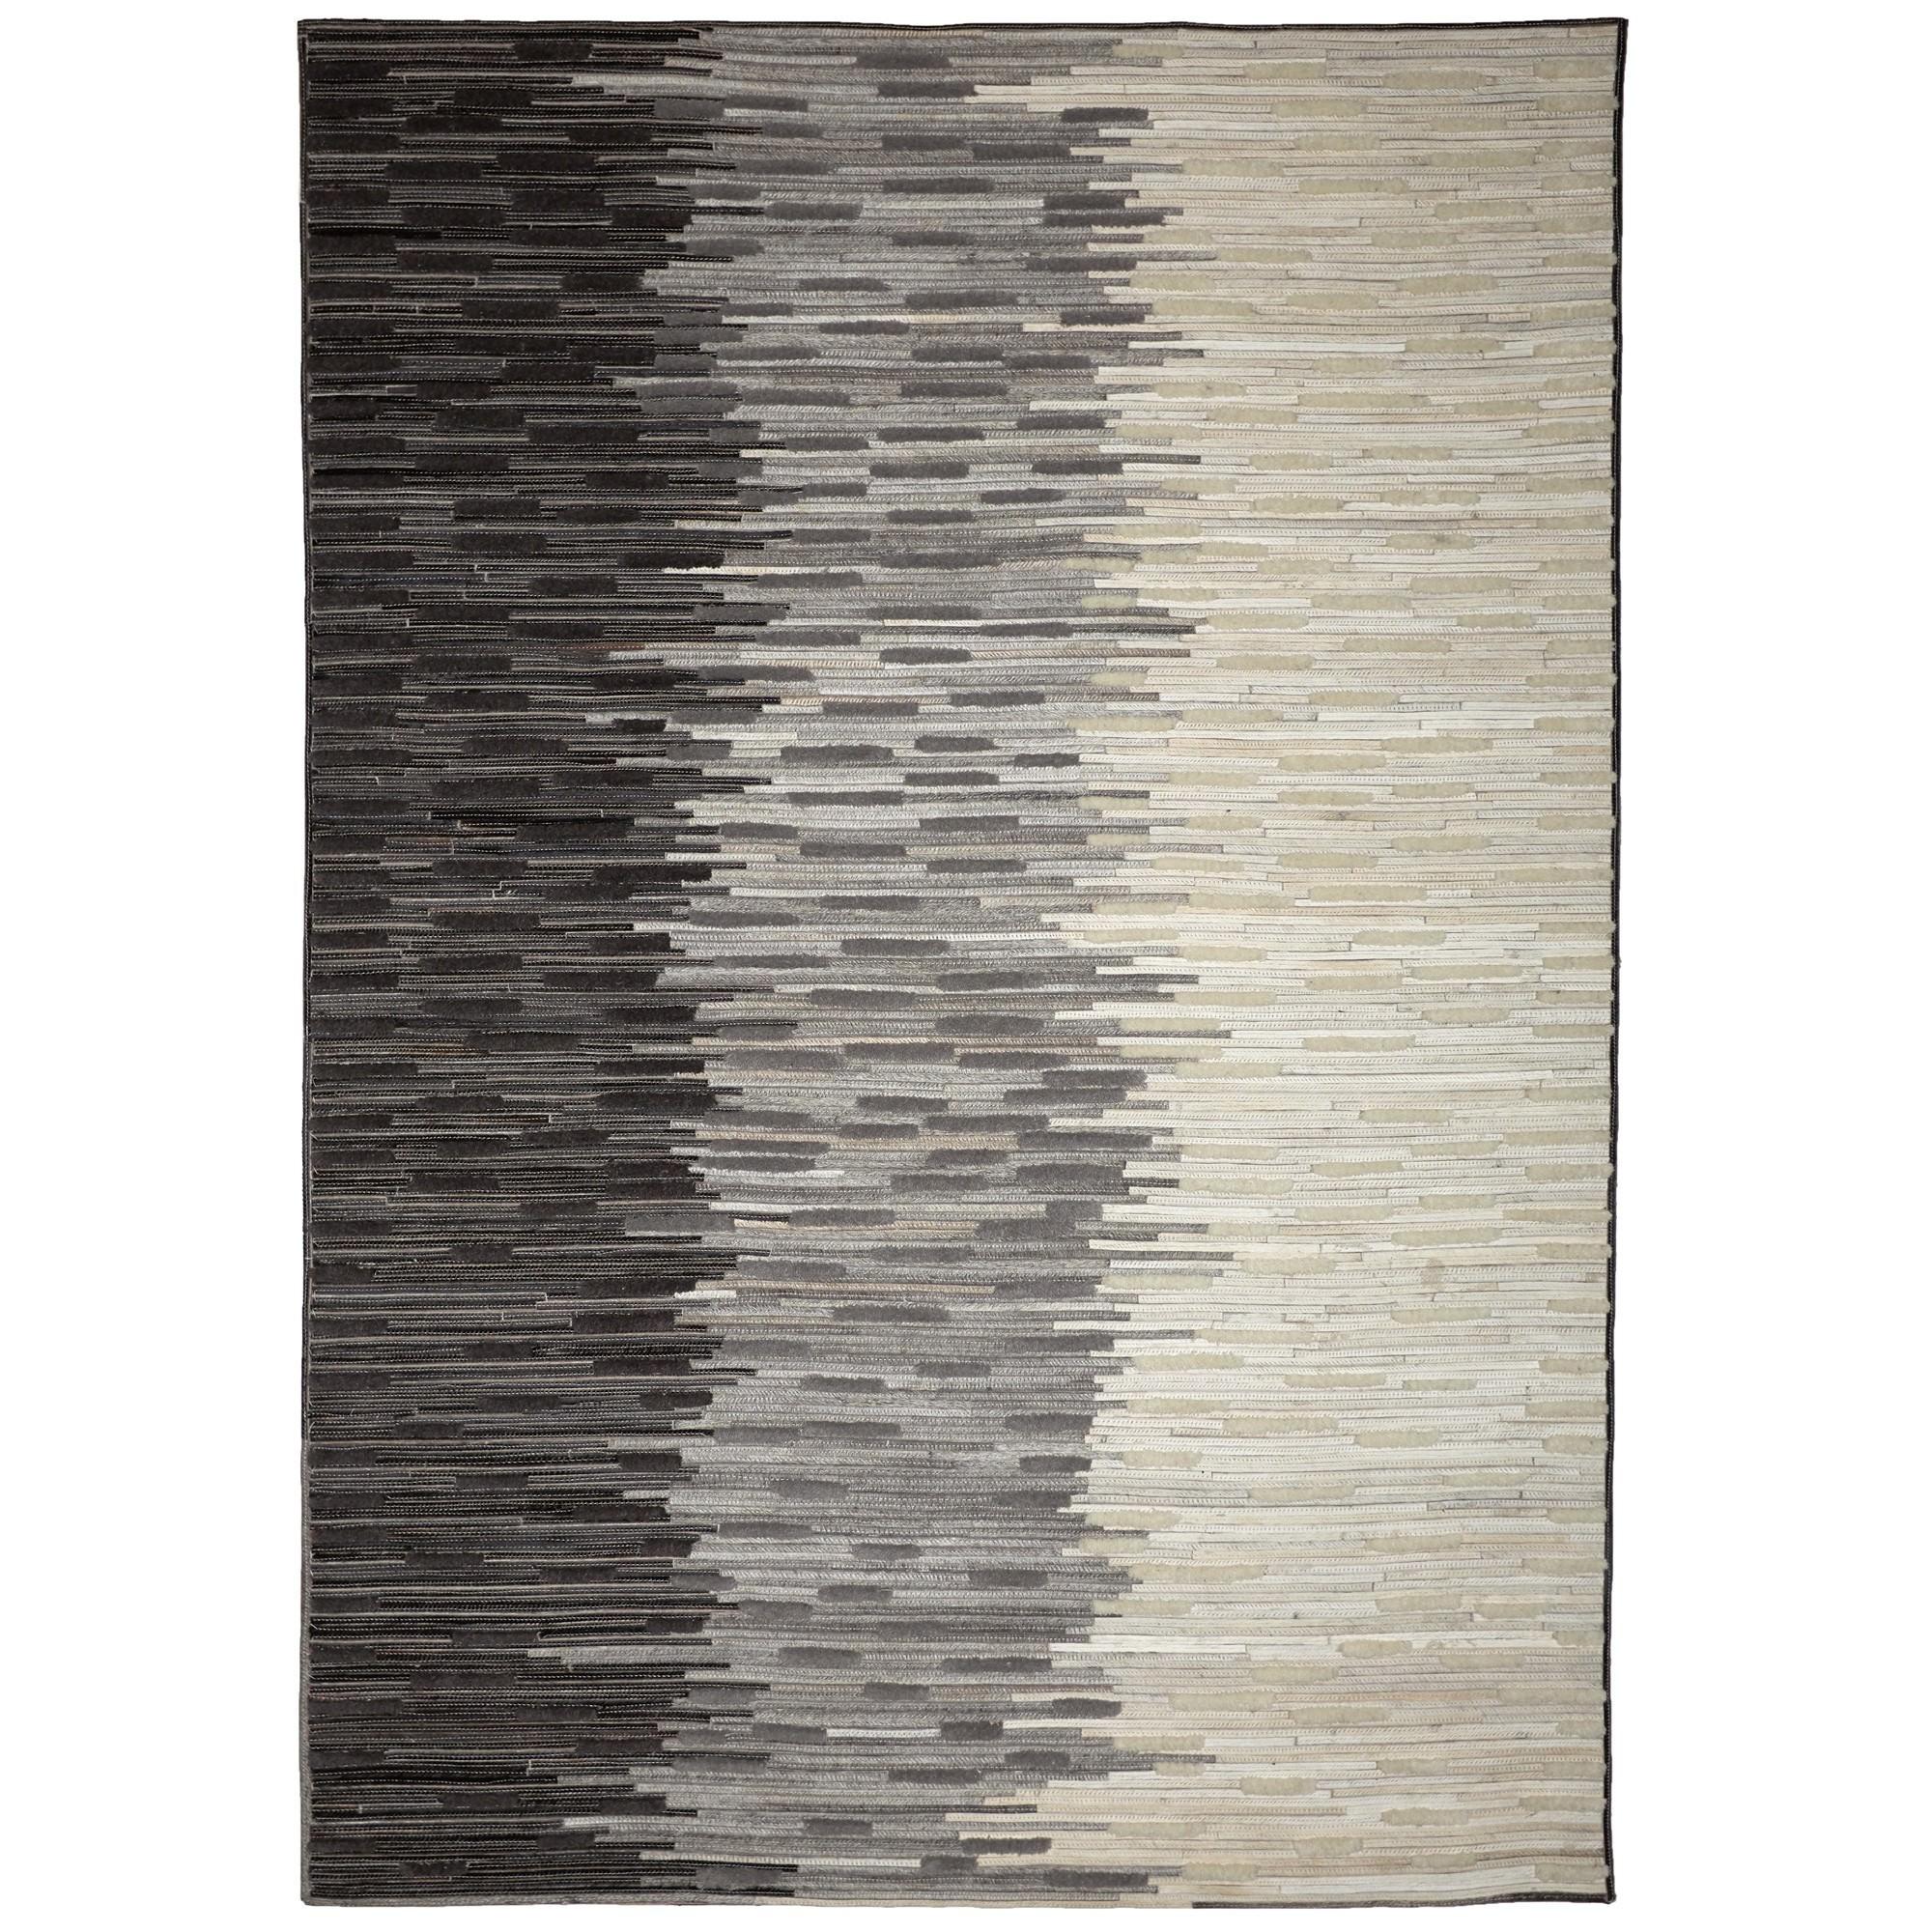 Mosaics No.400 Hide Leather Rug, 290x200cm